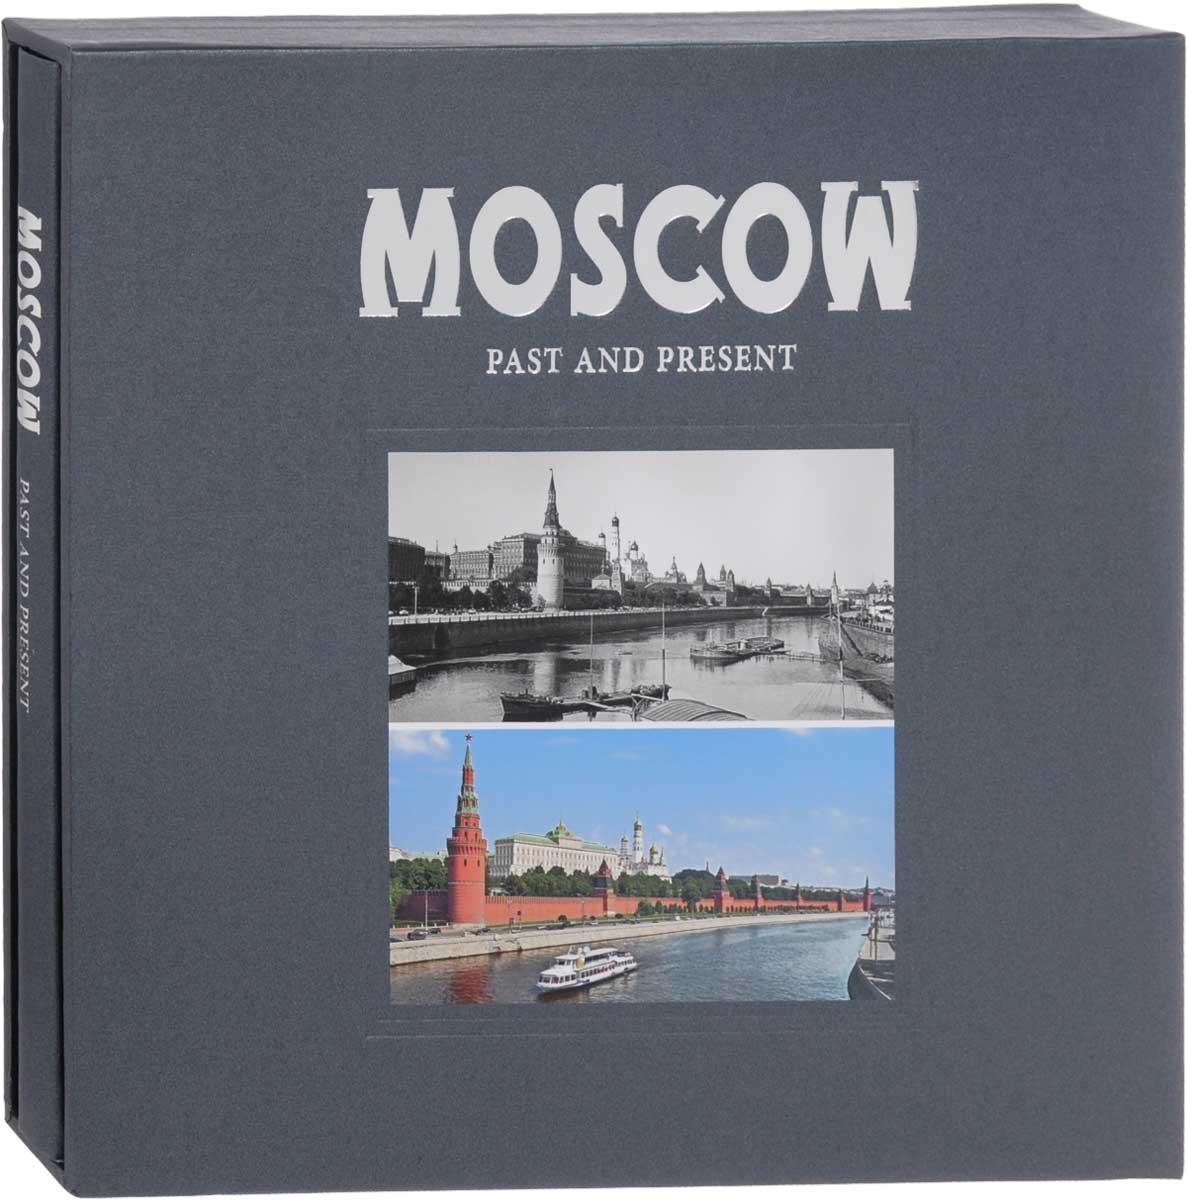 Valery Pavlinov Moscow: Past and Present: Album